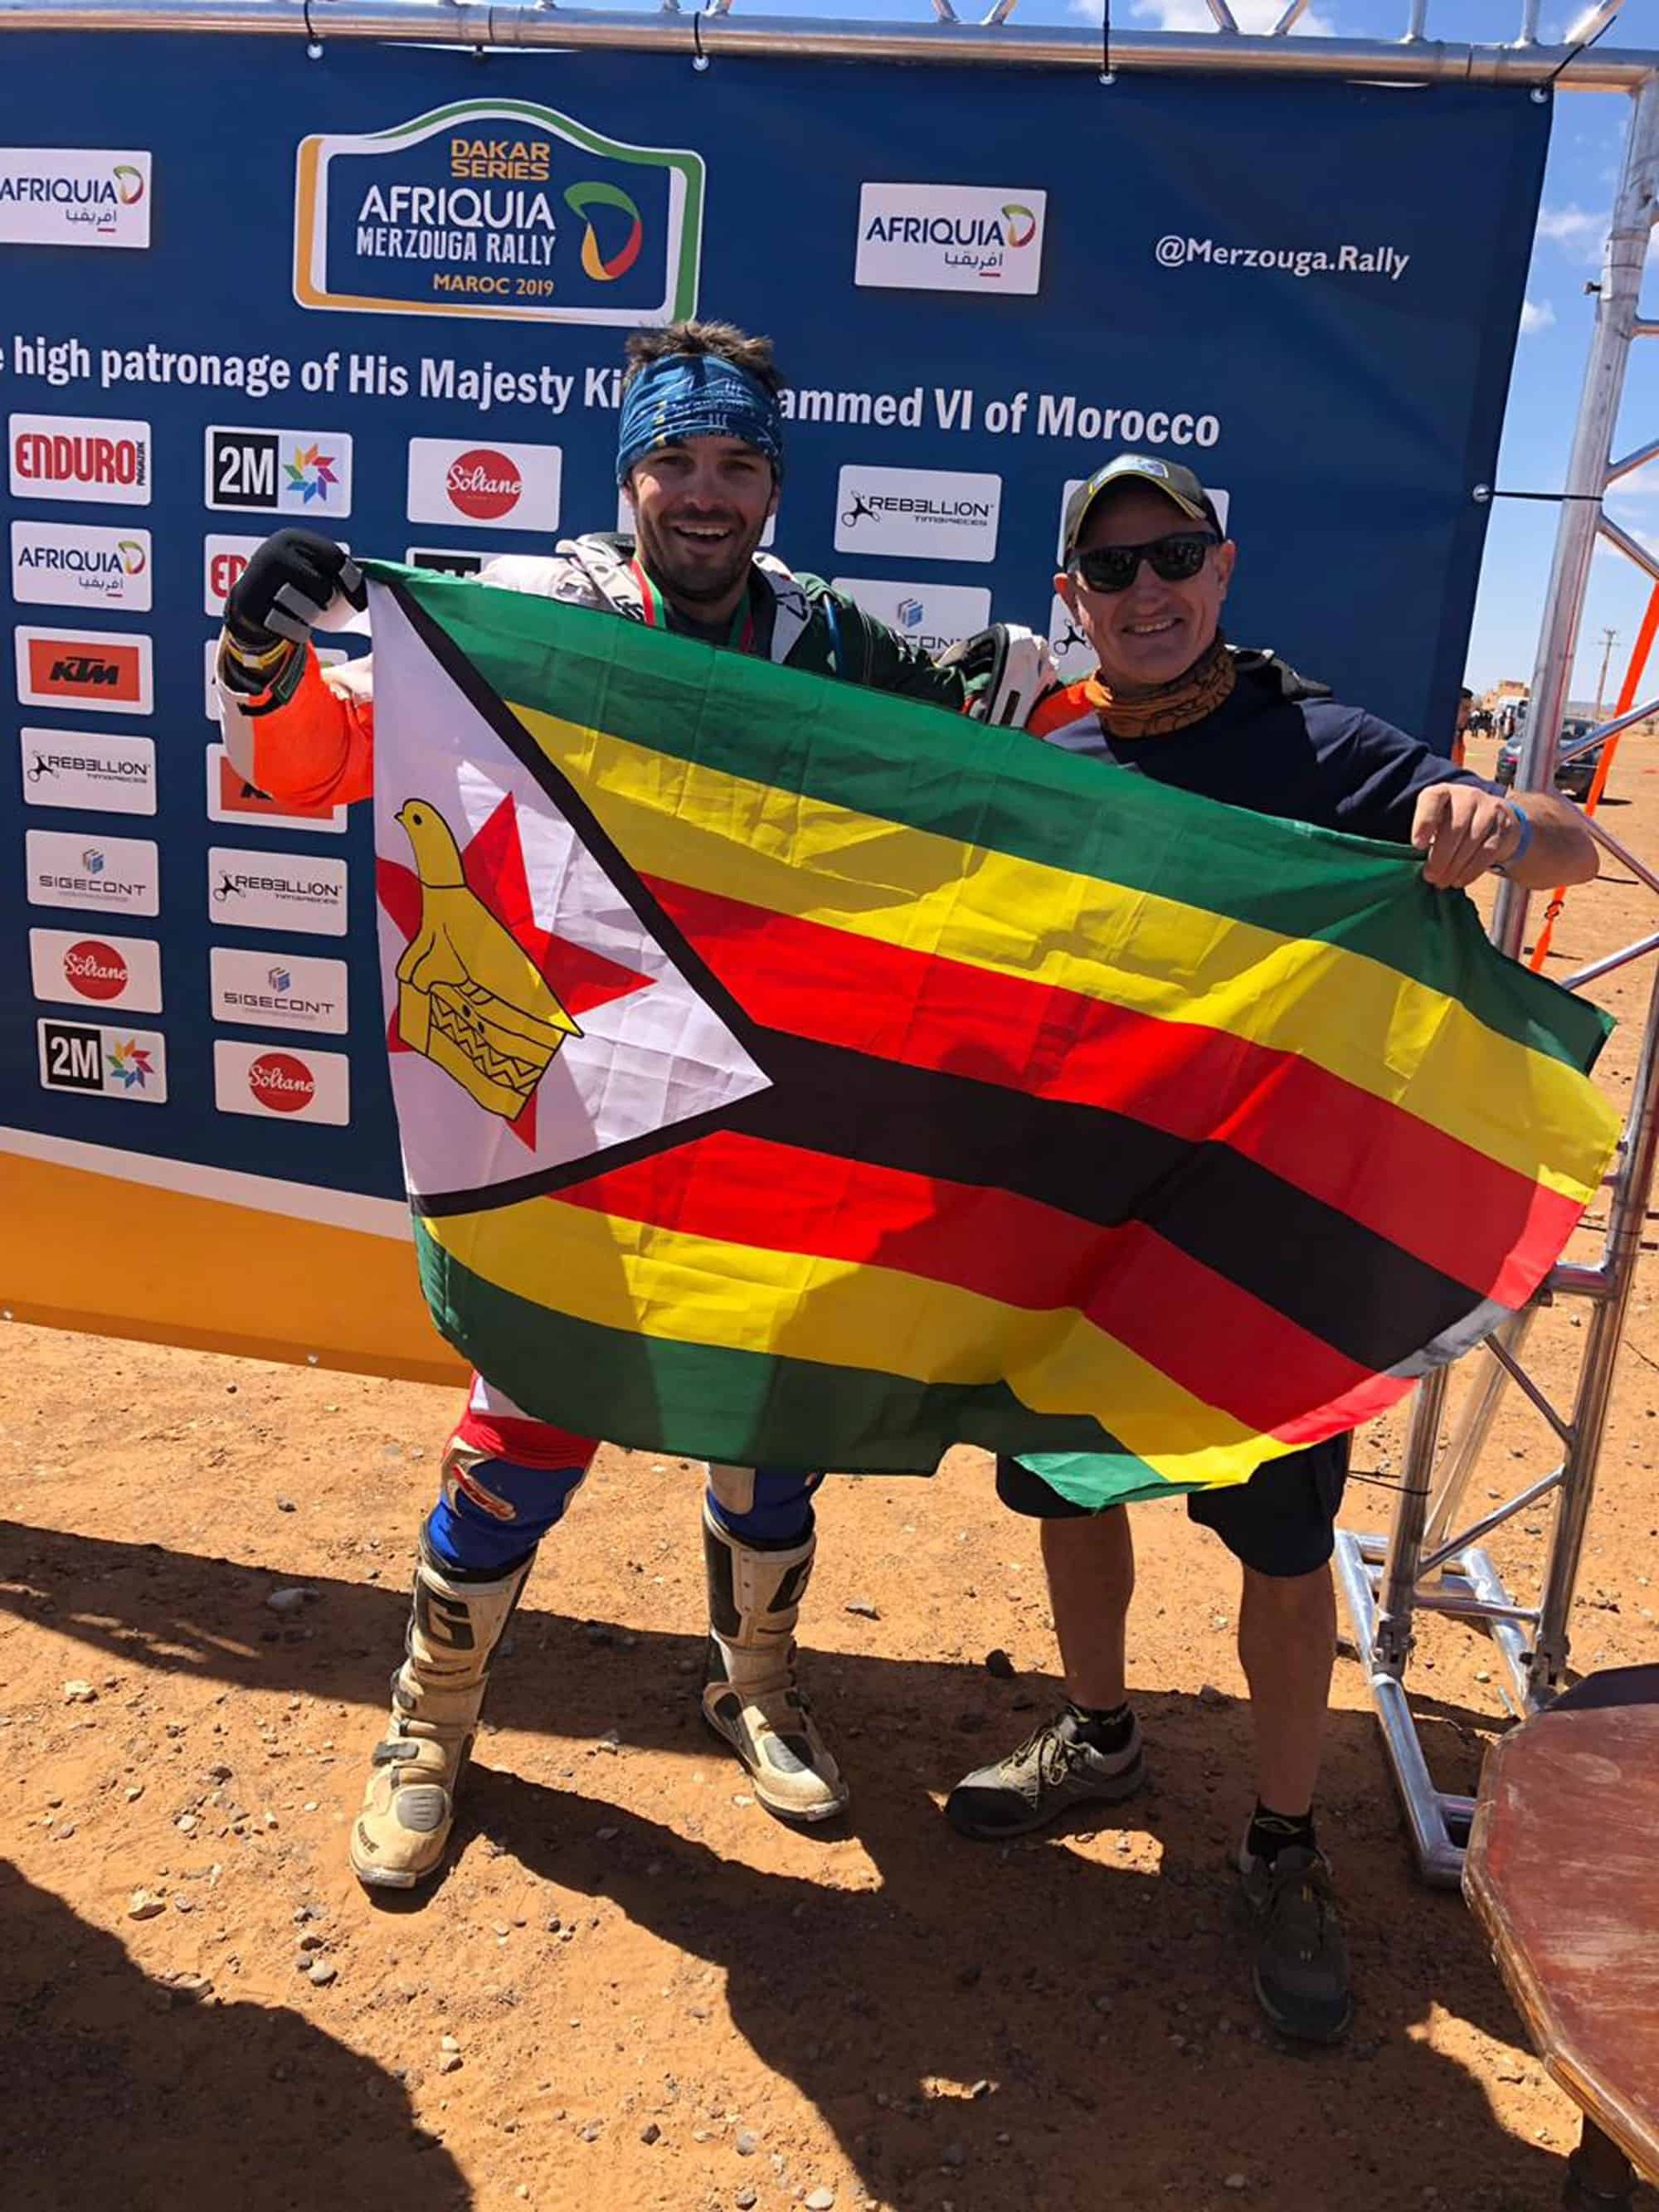 Zimbabwe Dakar Rider